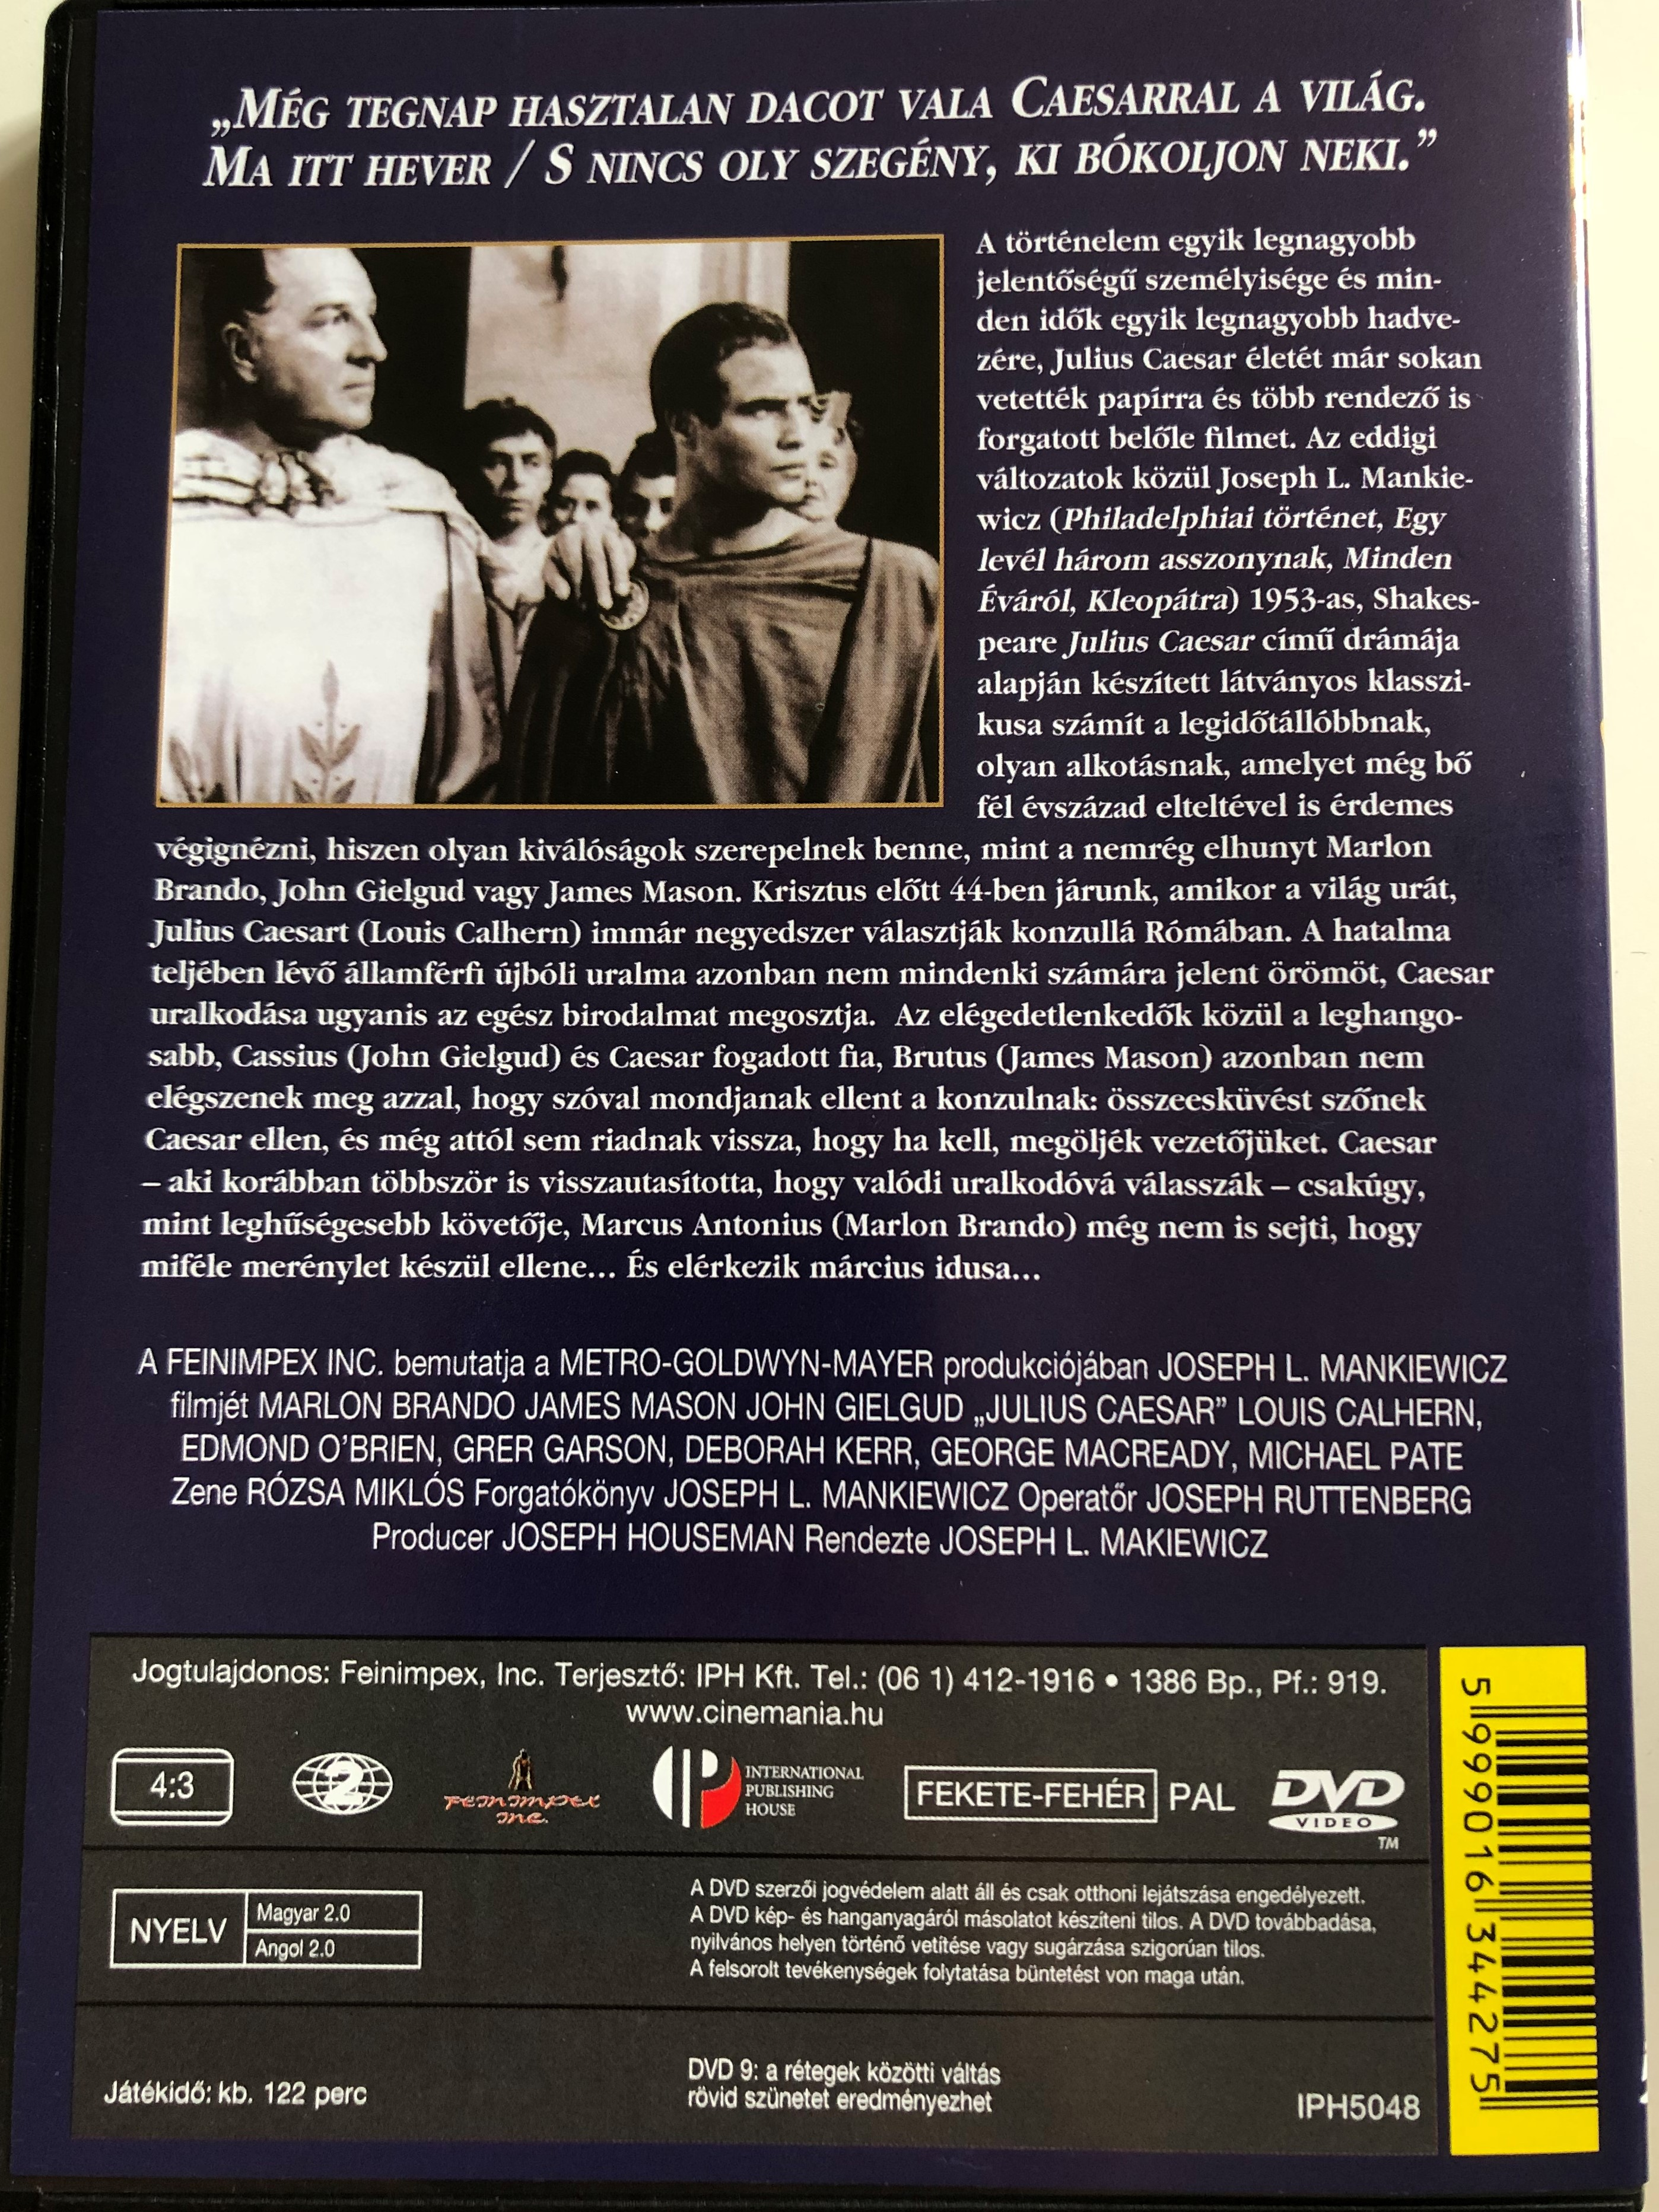 julius-caesar-dvd-1953-directed-by-joseph-l.-mankiewicz-starring-marlon-brando-james-mason-john-gielgud-louis-calhern-edmond-o-brien-greer-garson-deborah-kerr-1954-oscar-winner-2-.jpg